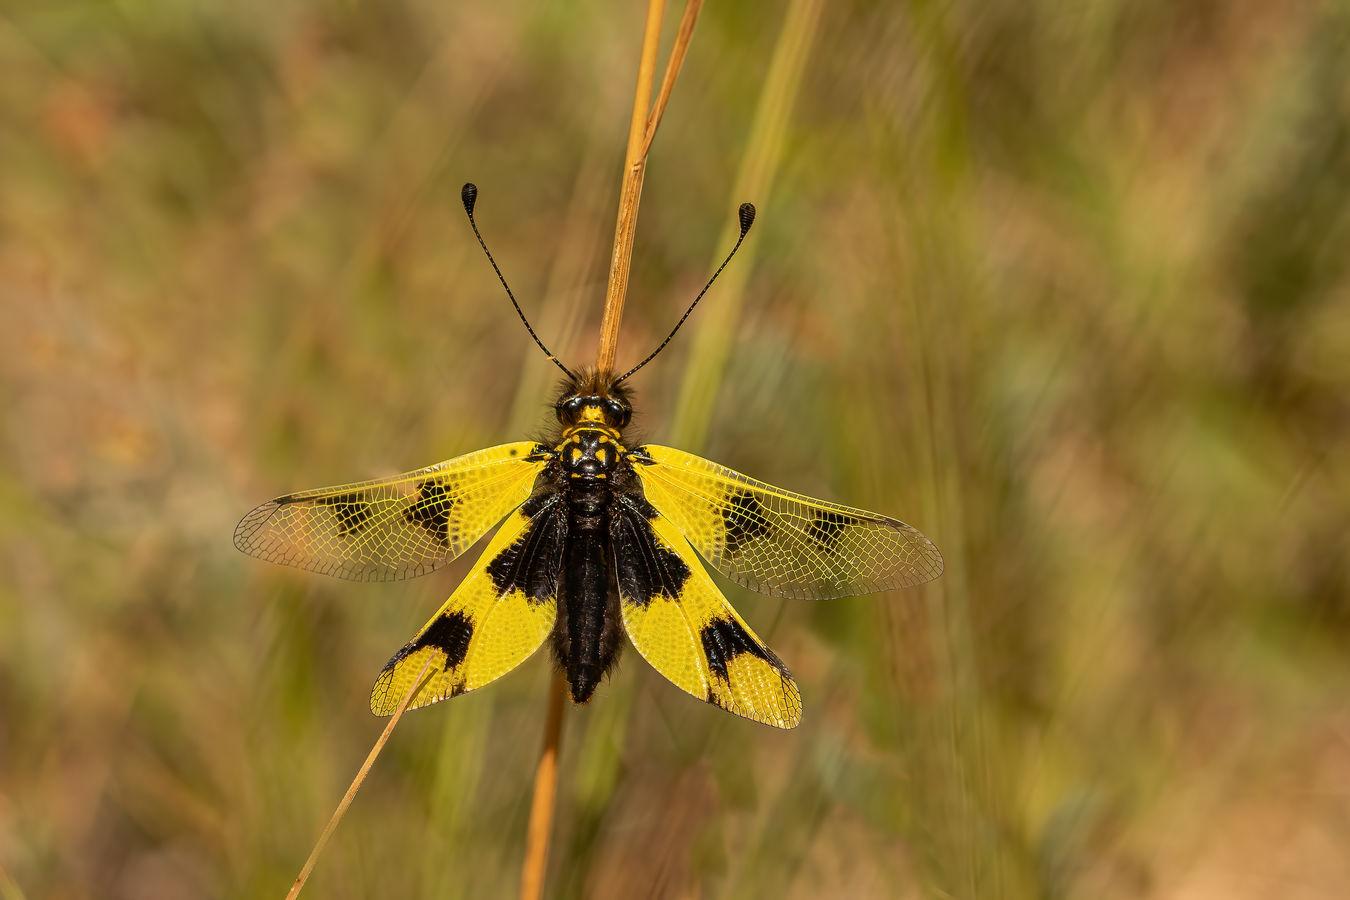 Ploskoroh pestrý (Libelloides macaronius )